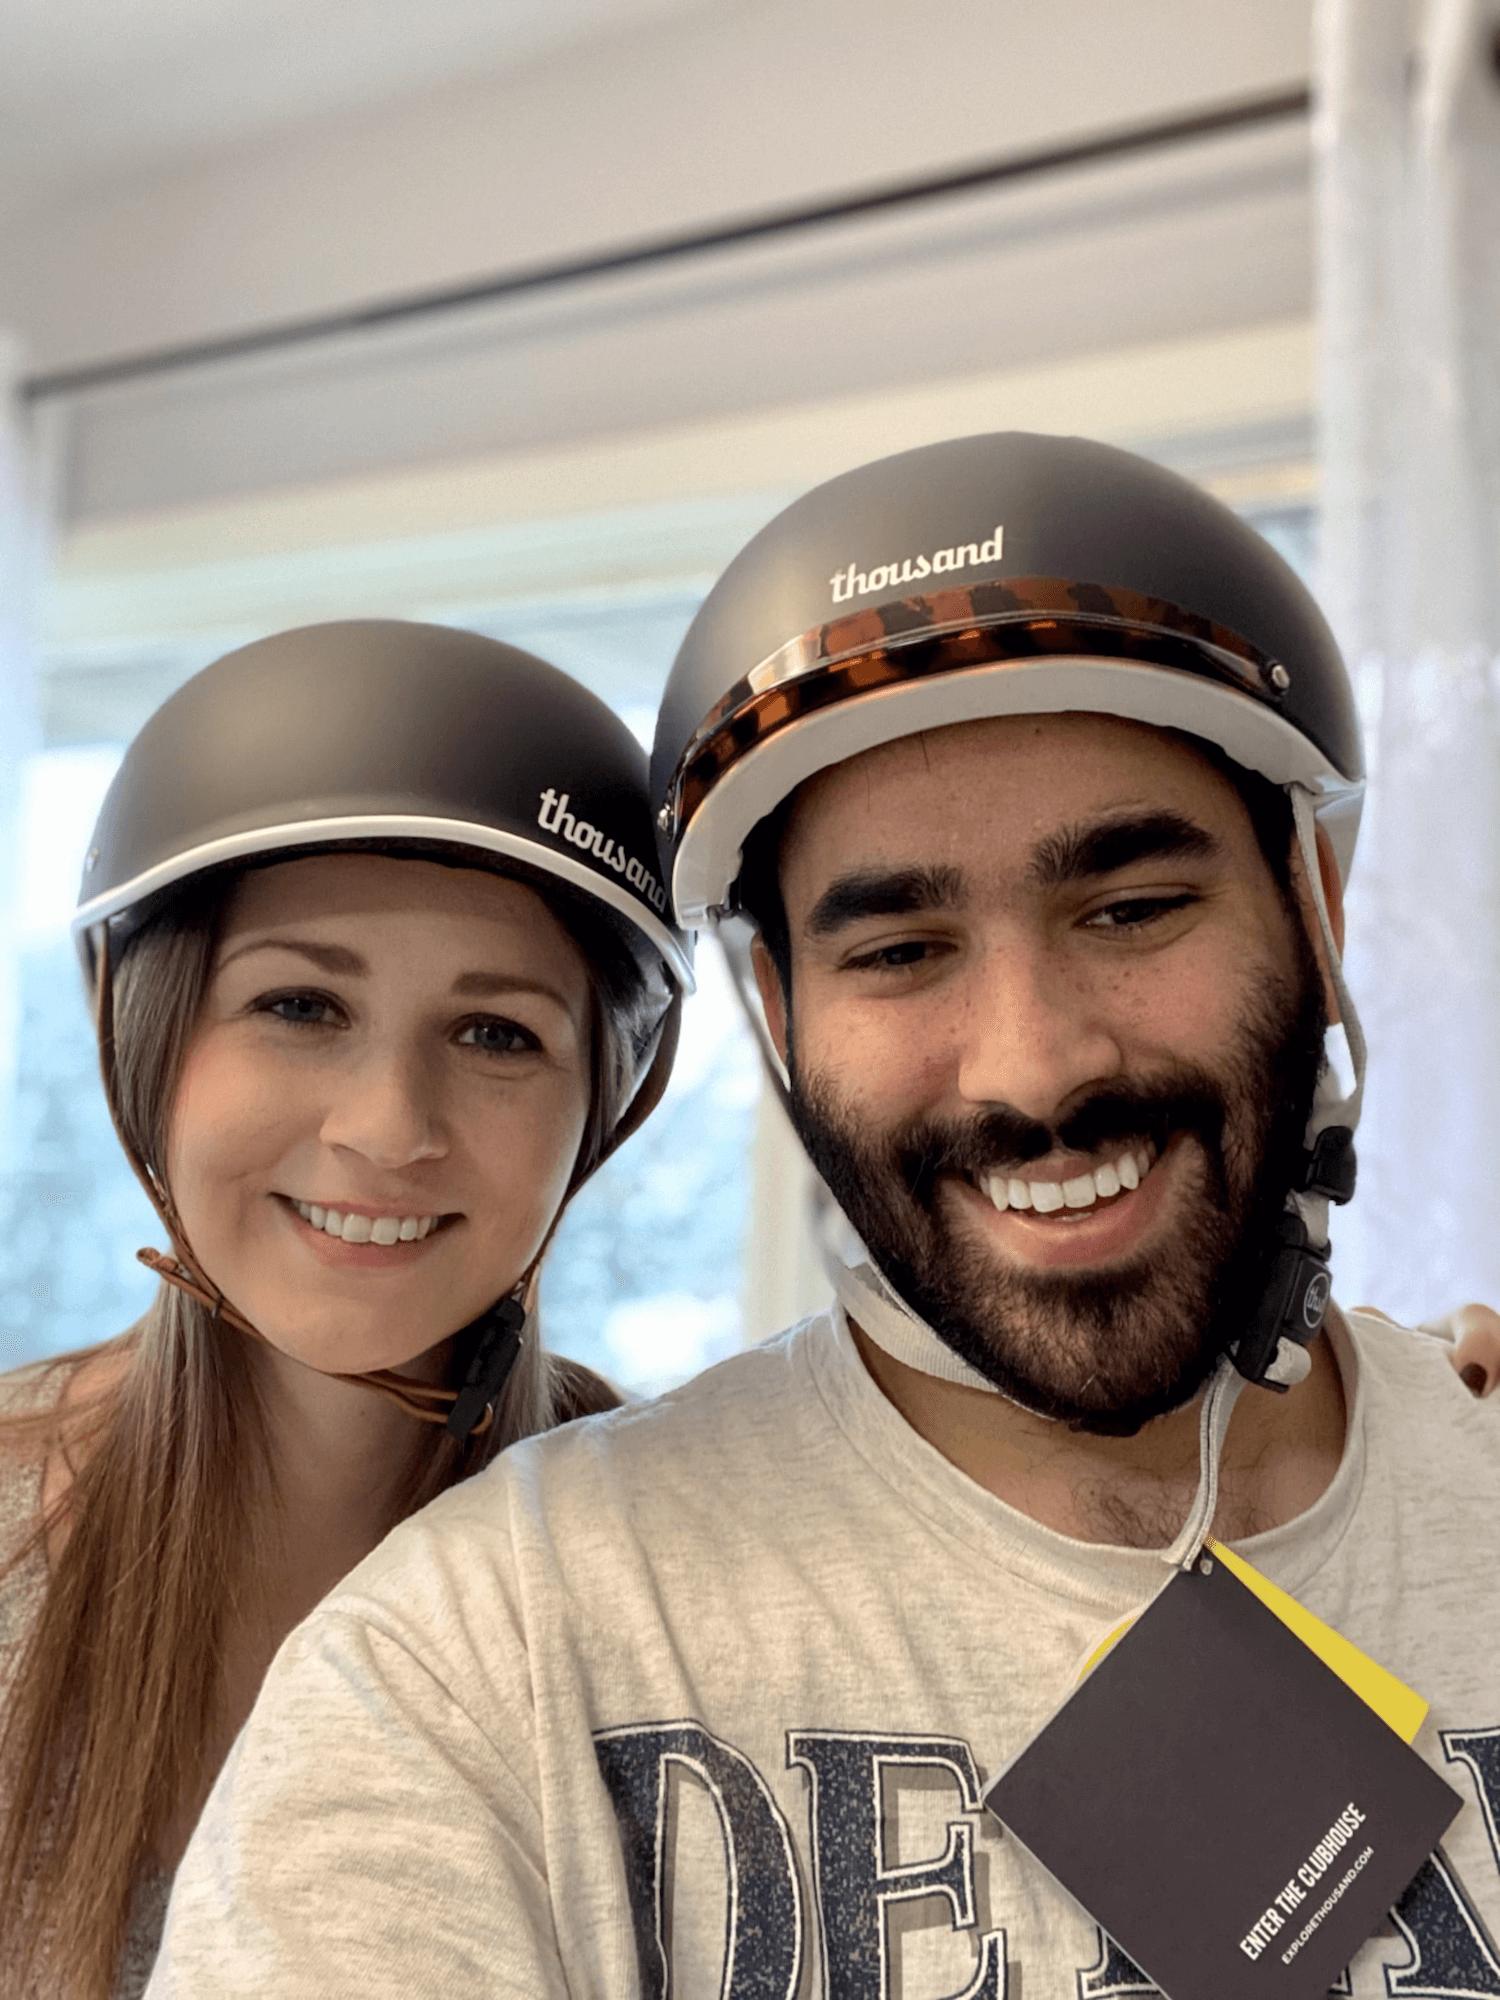 Mandy and Sagar wearing Thousand helmets